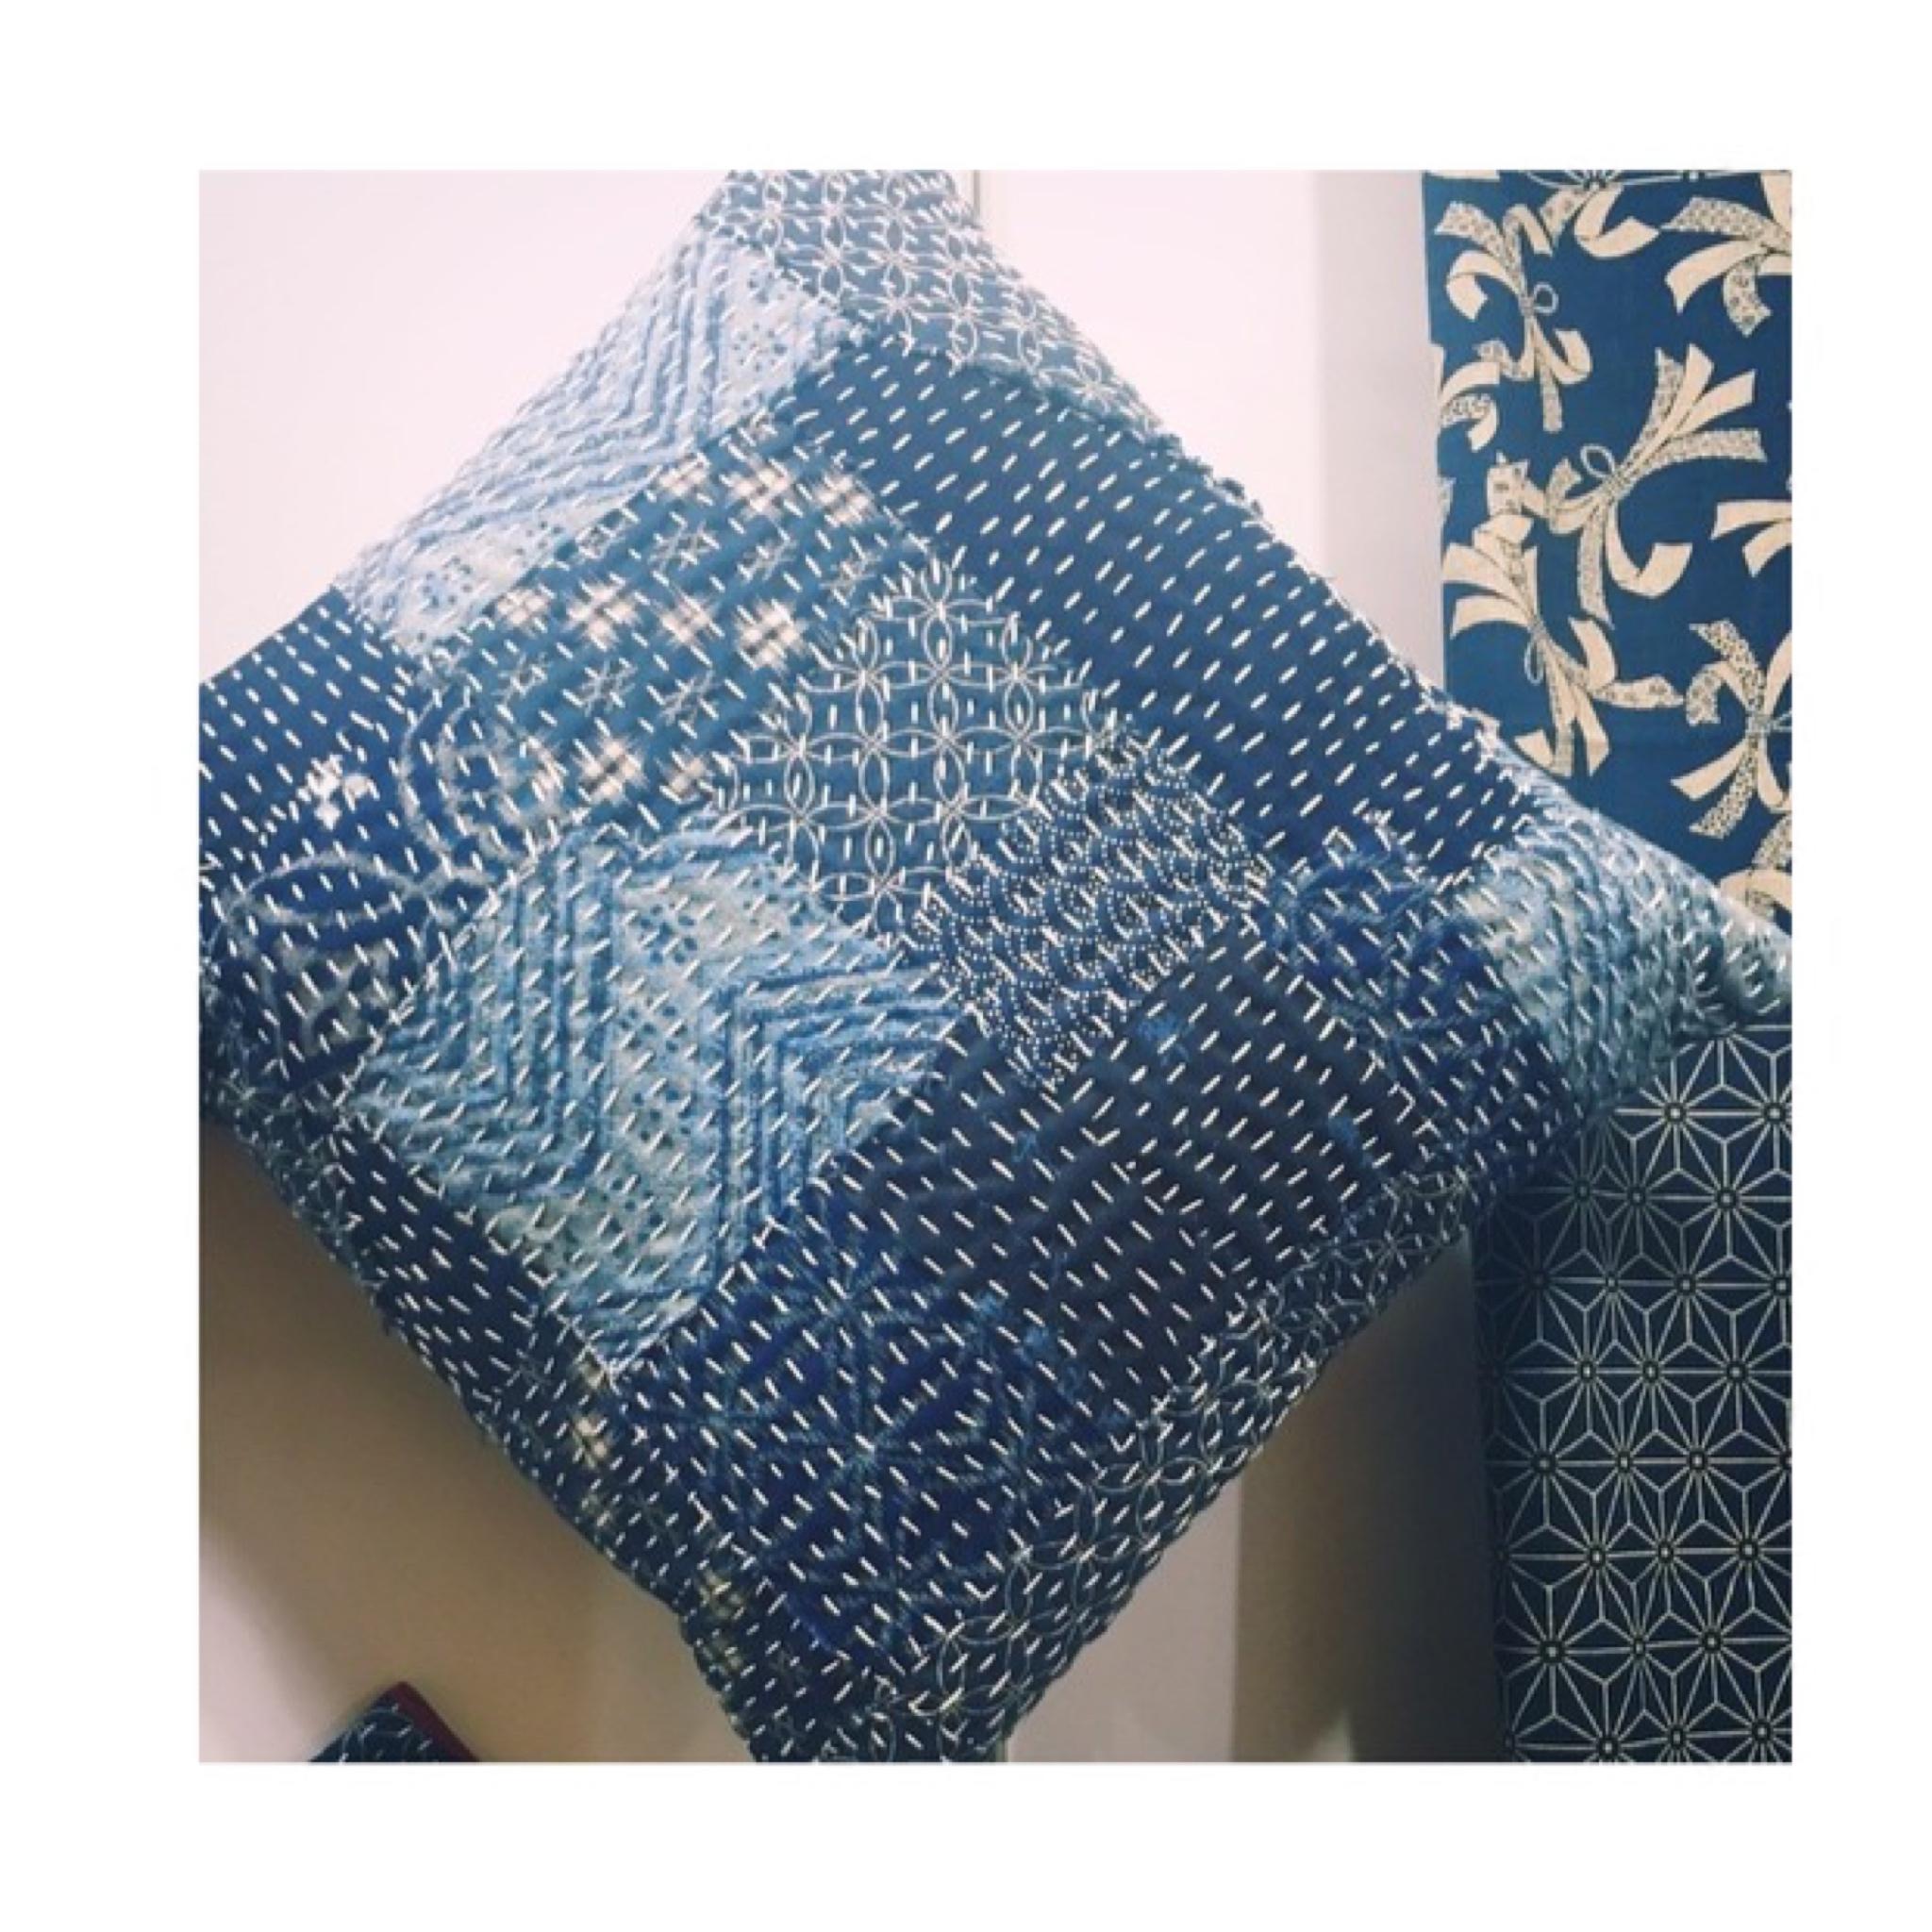 Boro o costura japonésa para moda sostenible